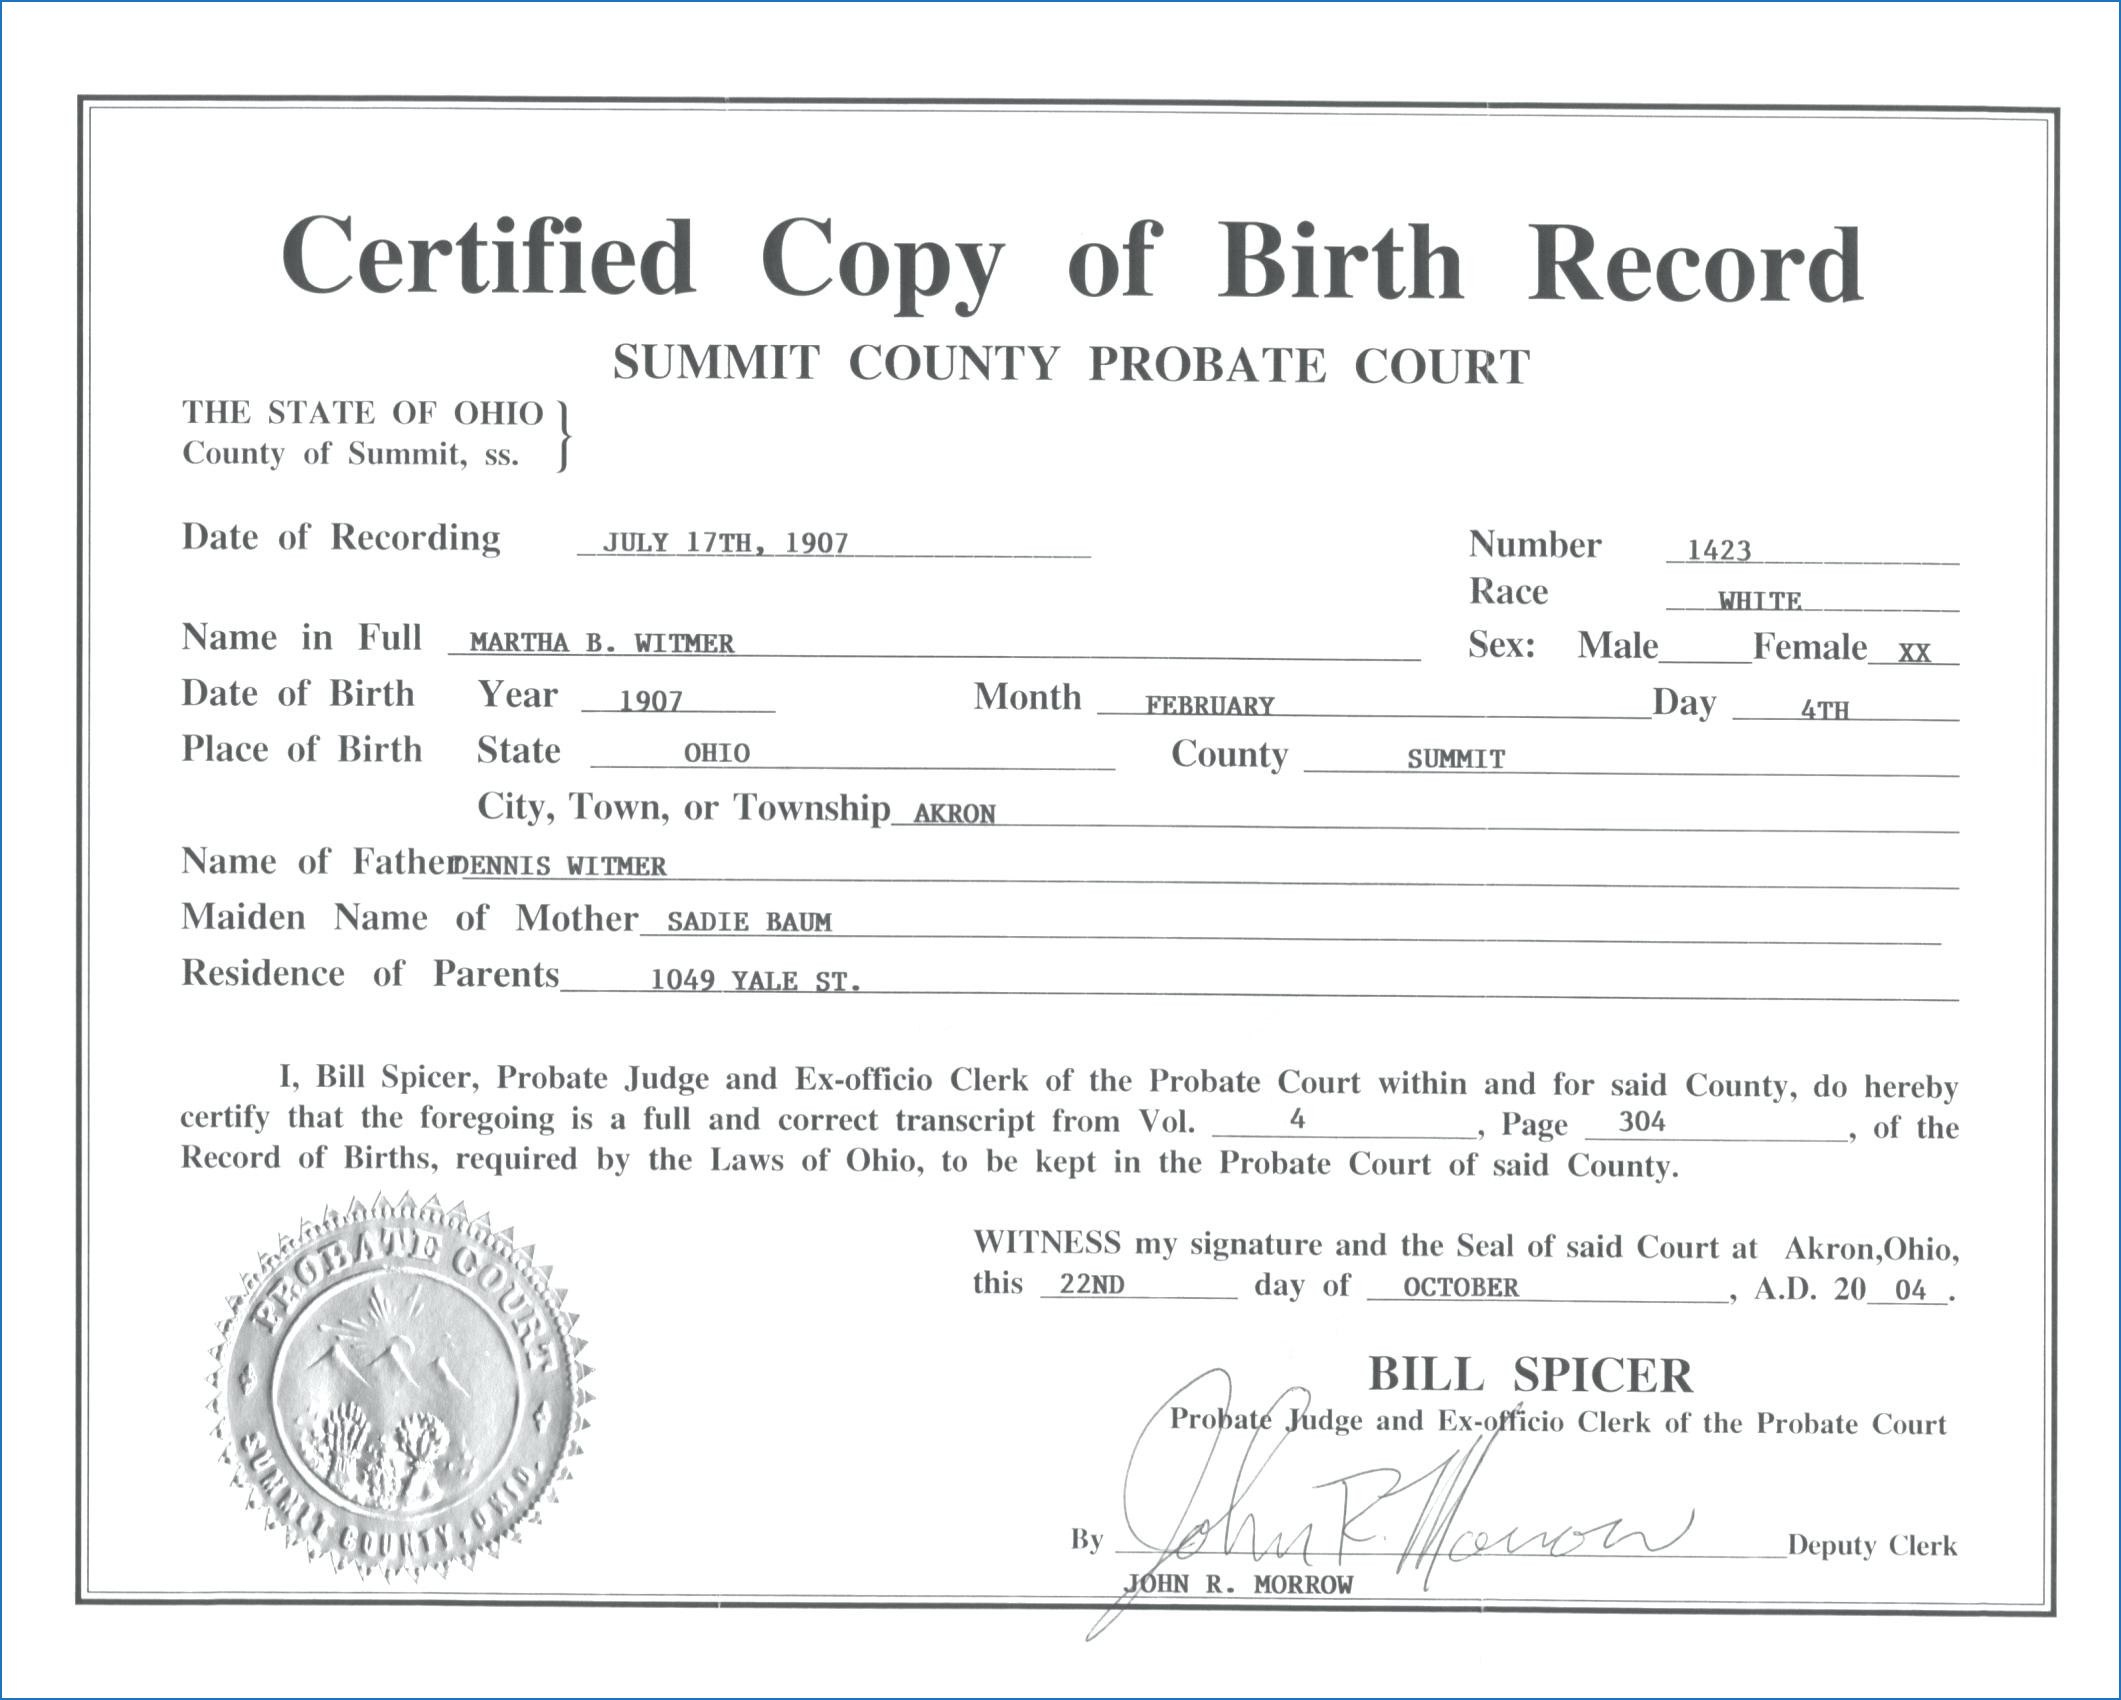 Birth Certificate Designs  Sansurabionetassociats Pertaining To Girl Birth Certificate Template